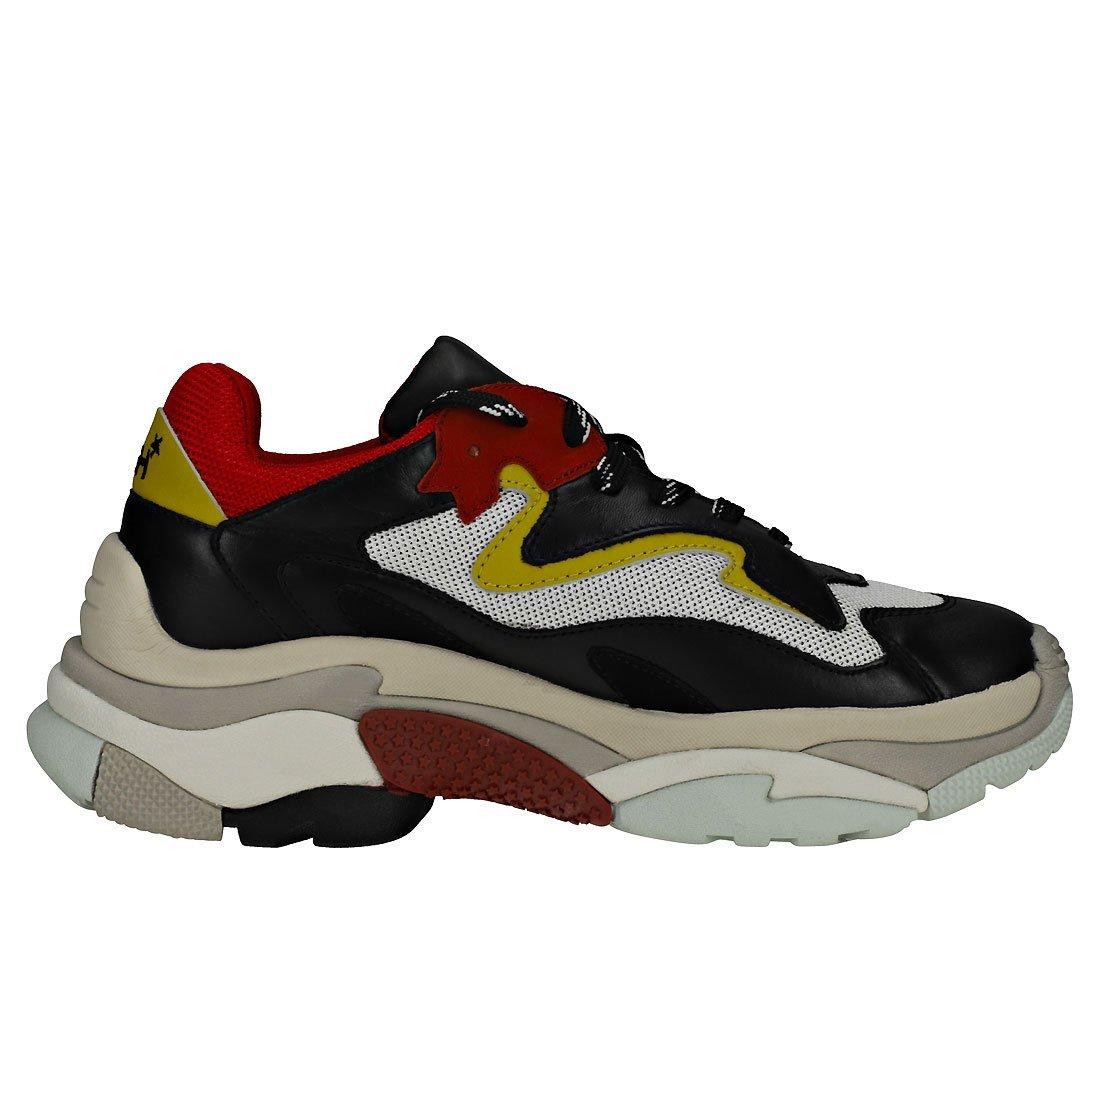 Ash Addict Womens Sneakers Multi